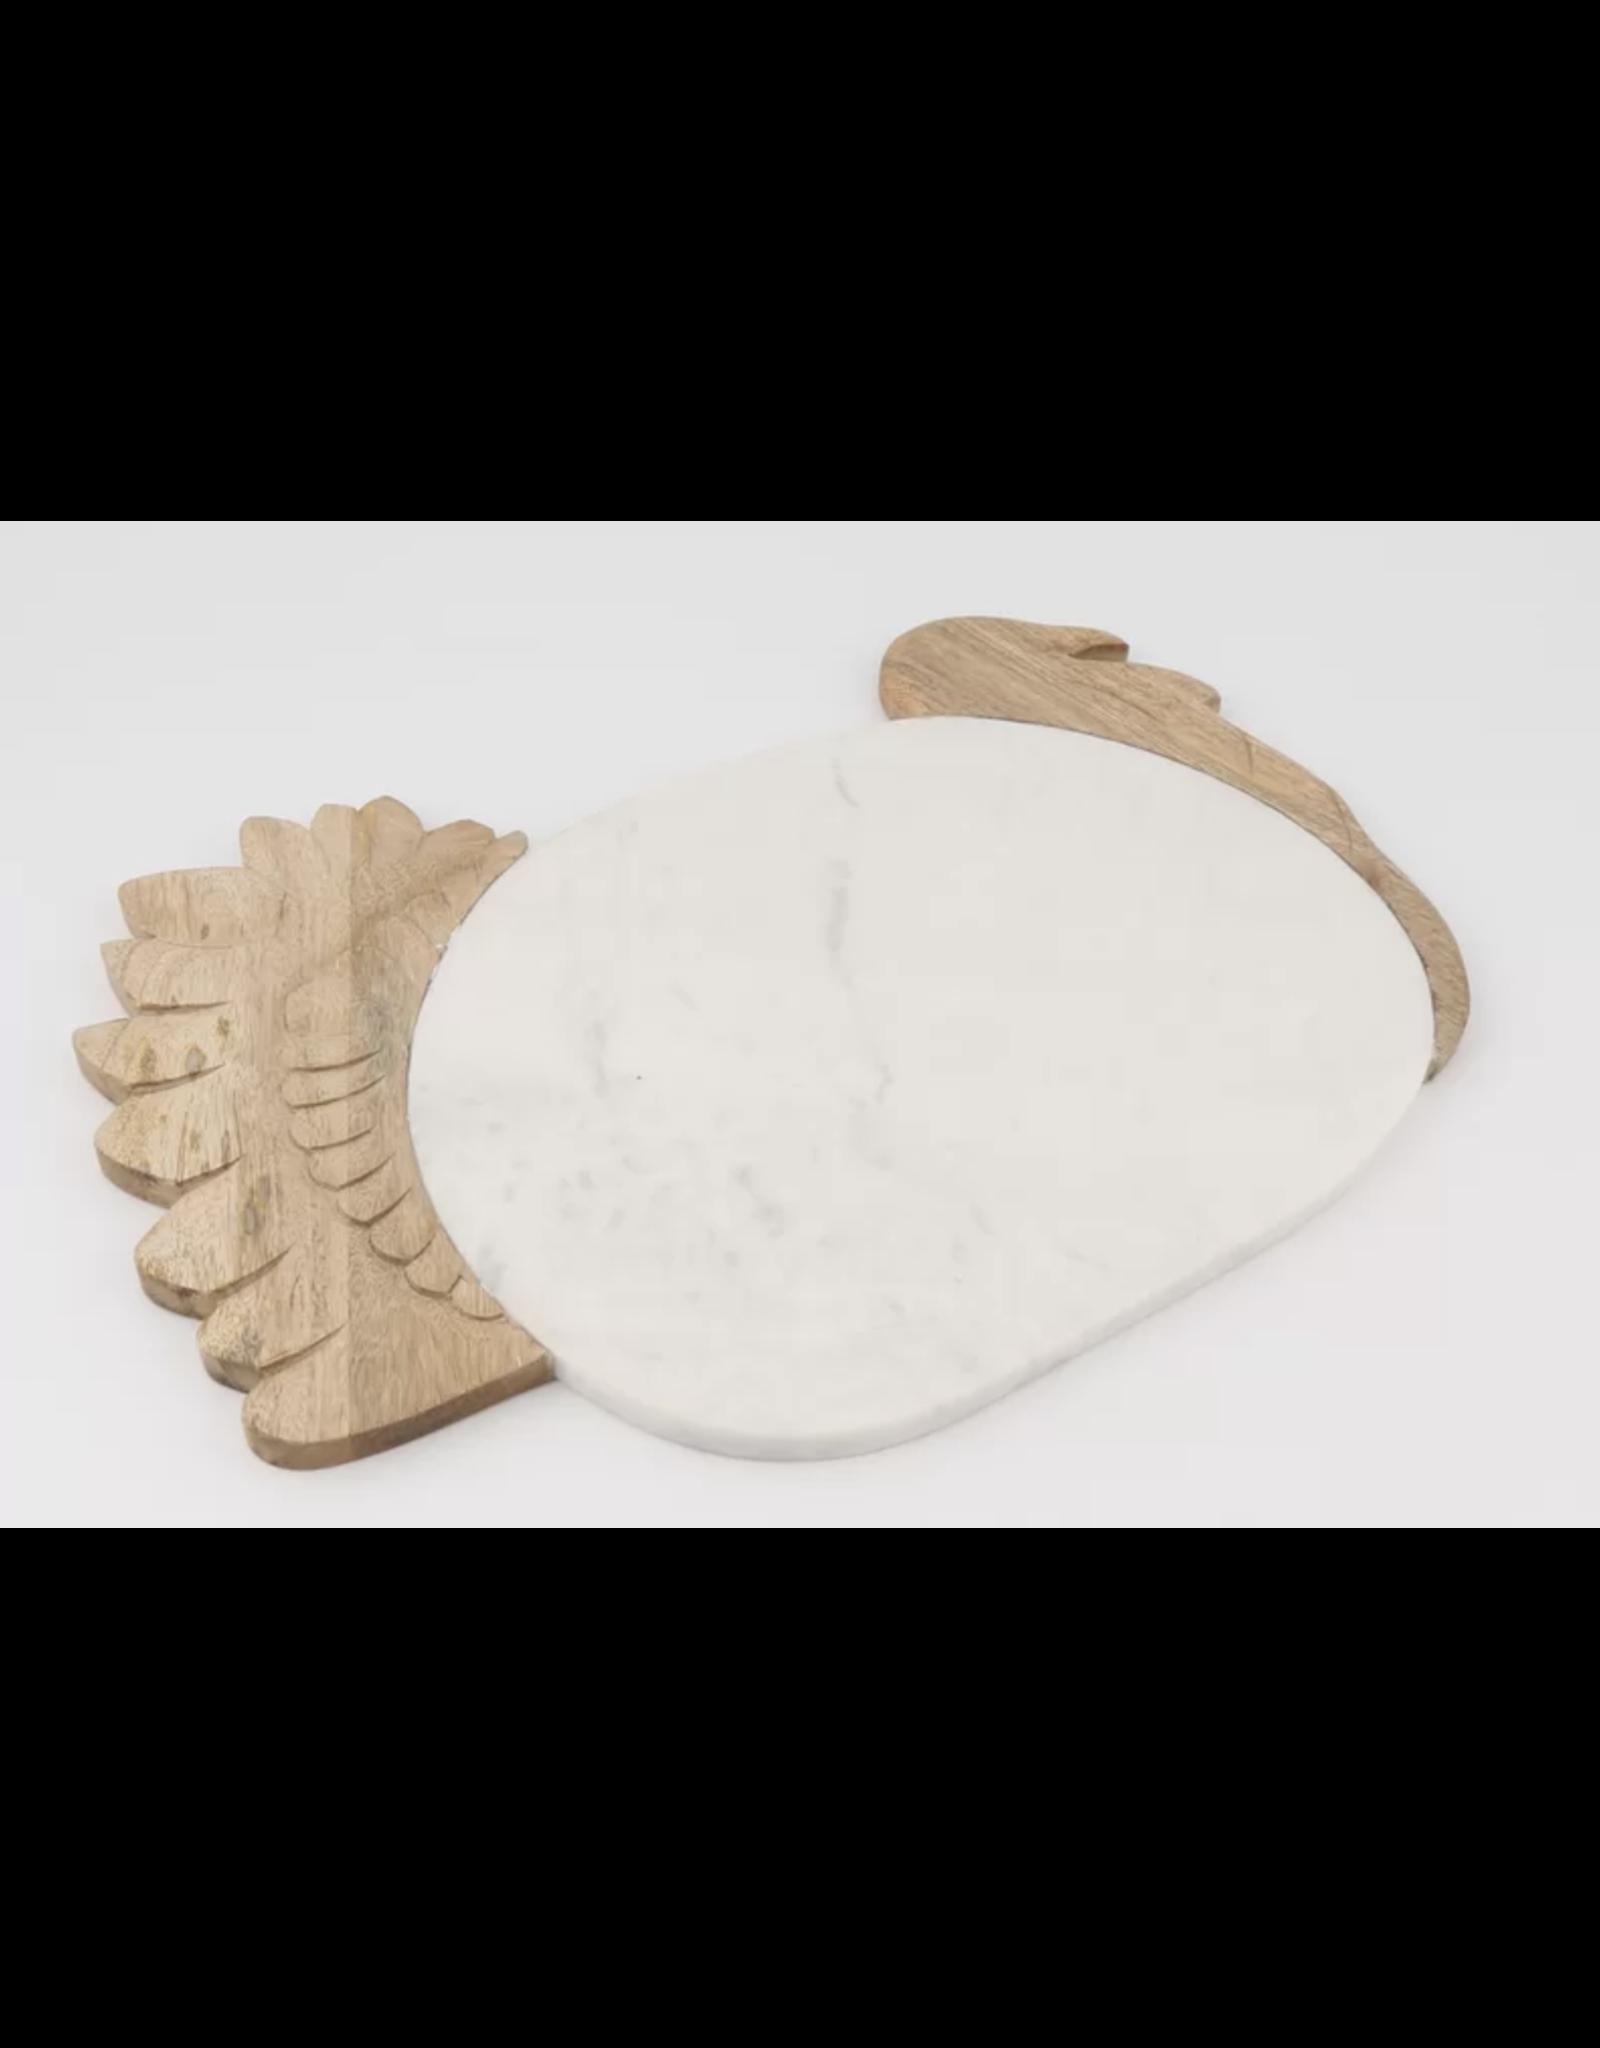 Thirstystone White Marble & Mango Wood Turkey Shape Serving Board